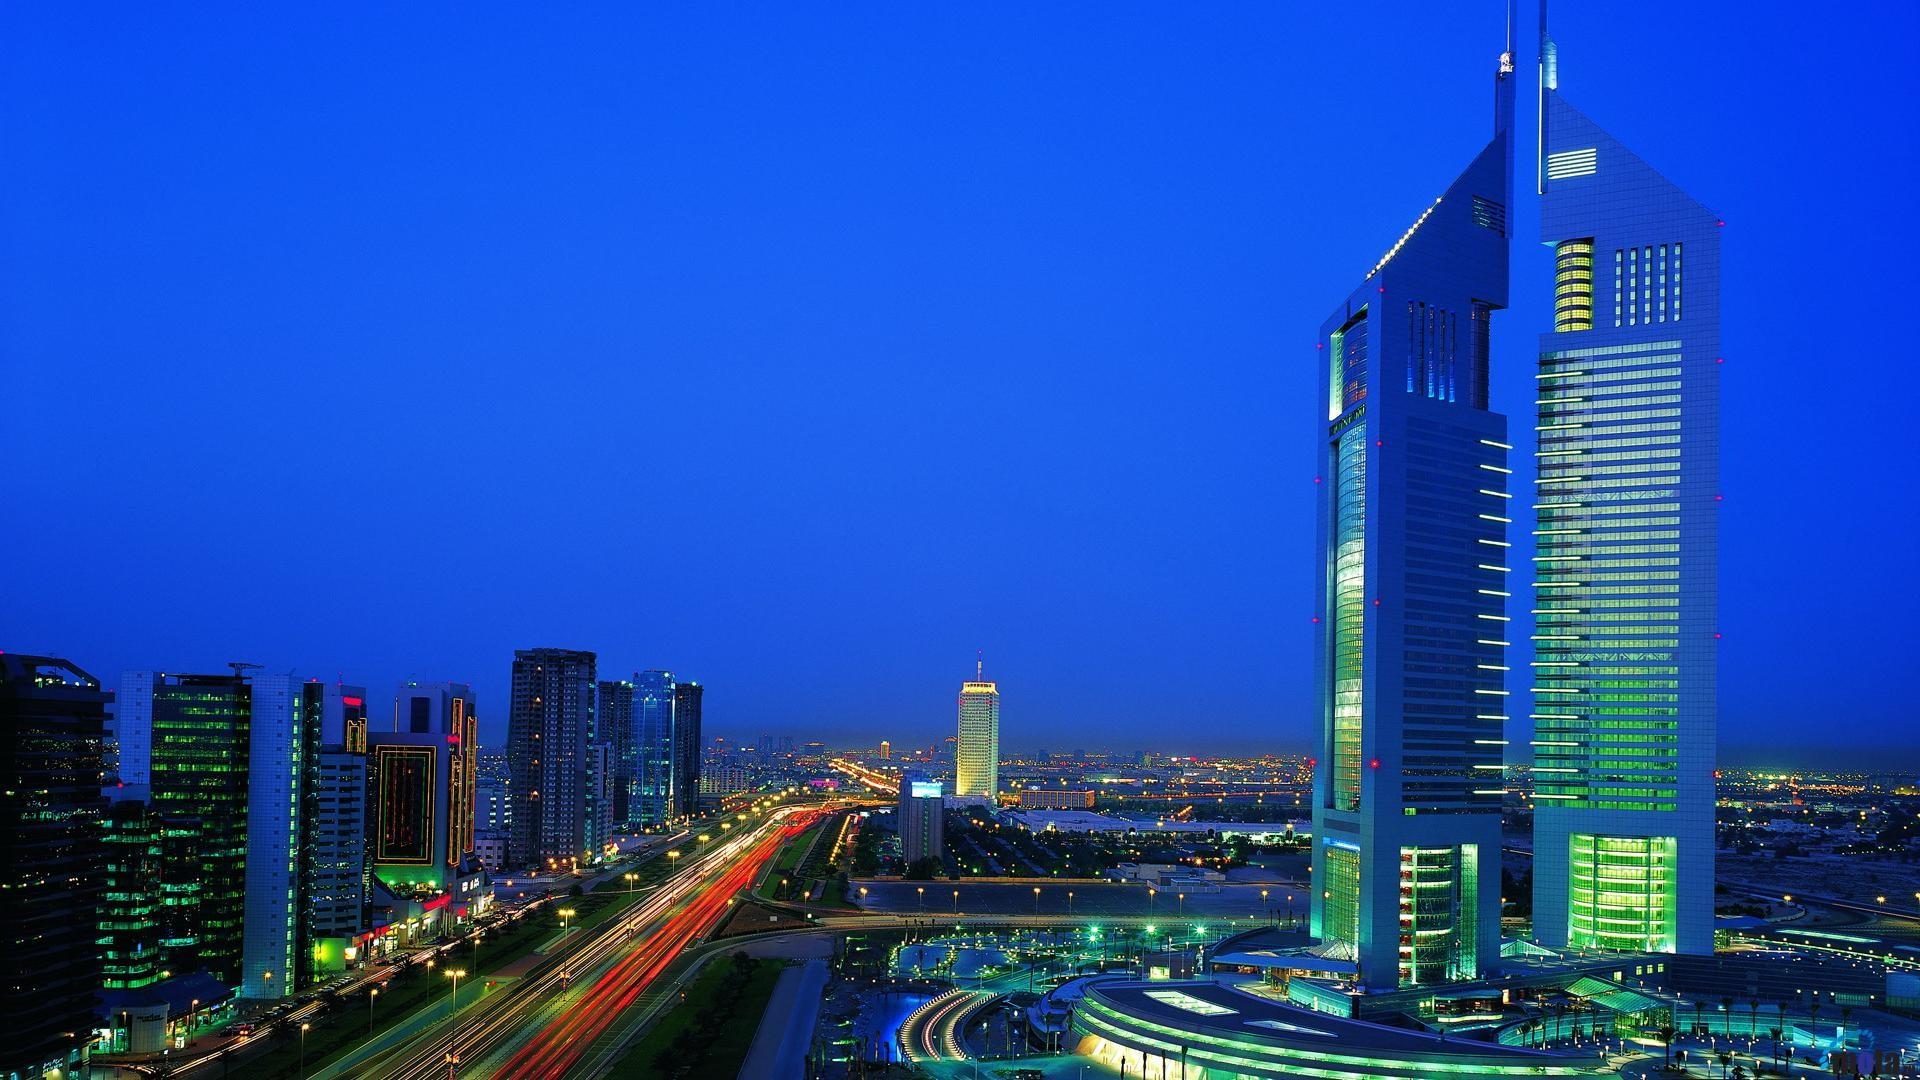 Best Dubai 1920×1080 Pictures See Here Beautiful Dubai City Night Images  And Top Dubai Hotels Pics Dubai Stock Photos Collection 2017.